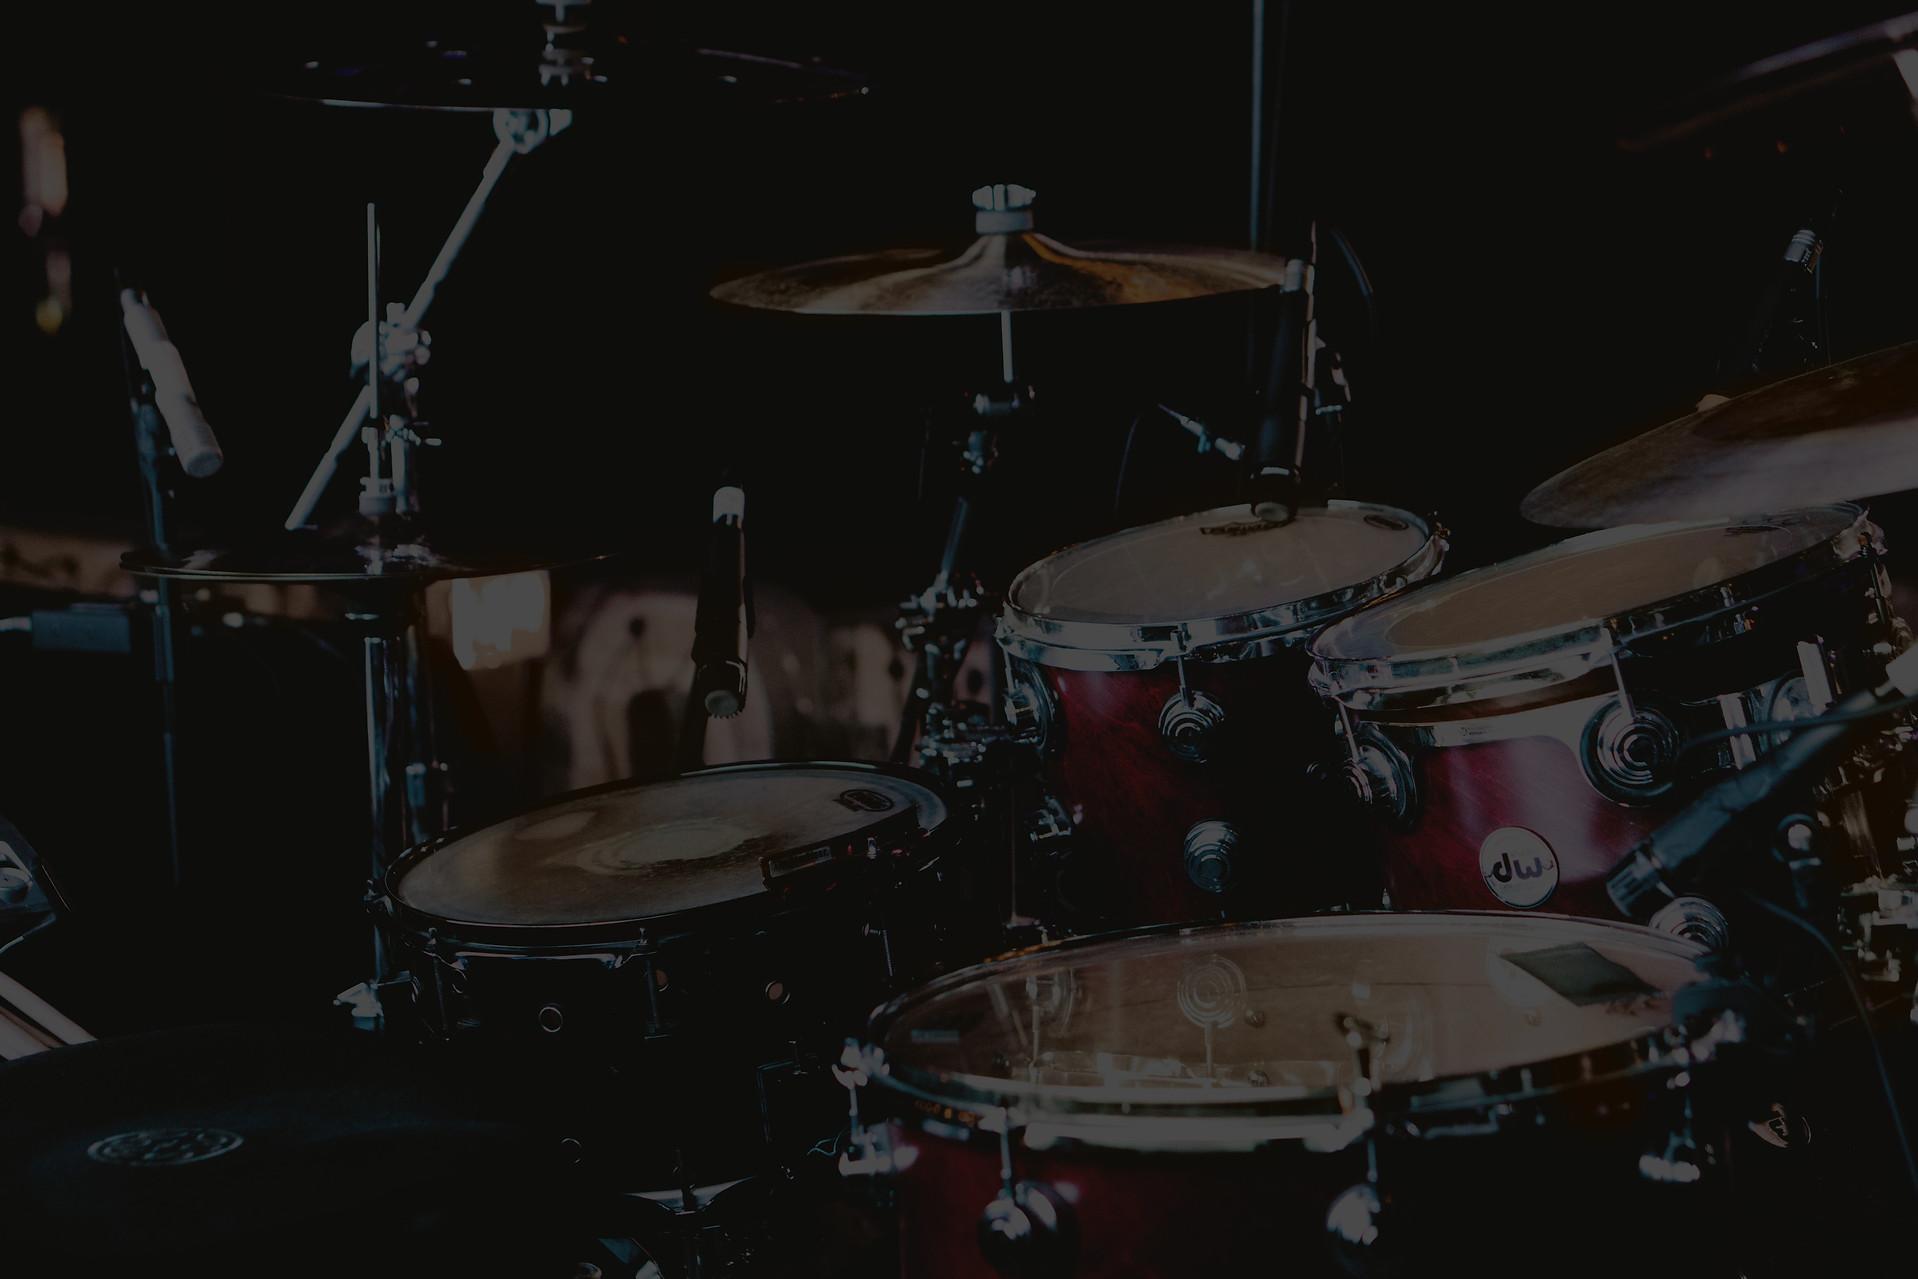 Drum%20Set_edited.jpg